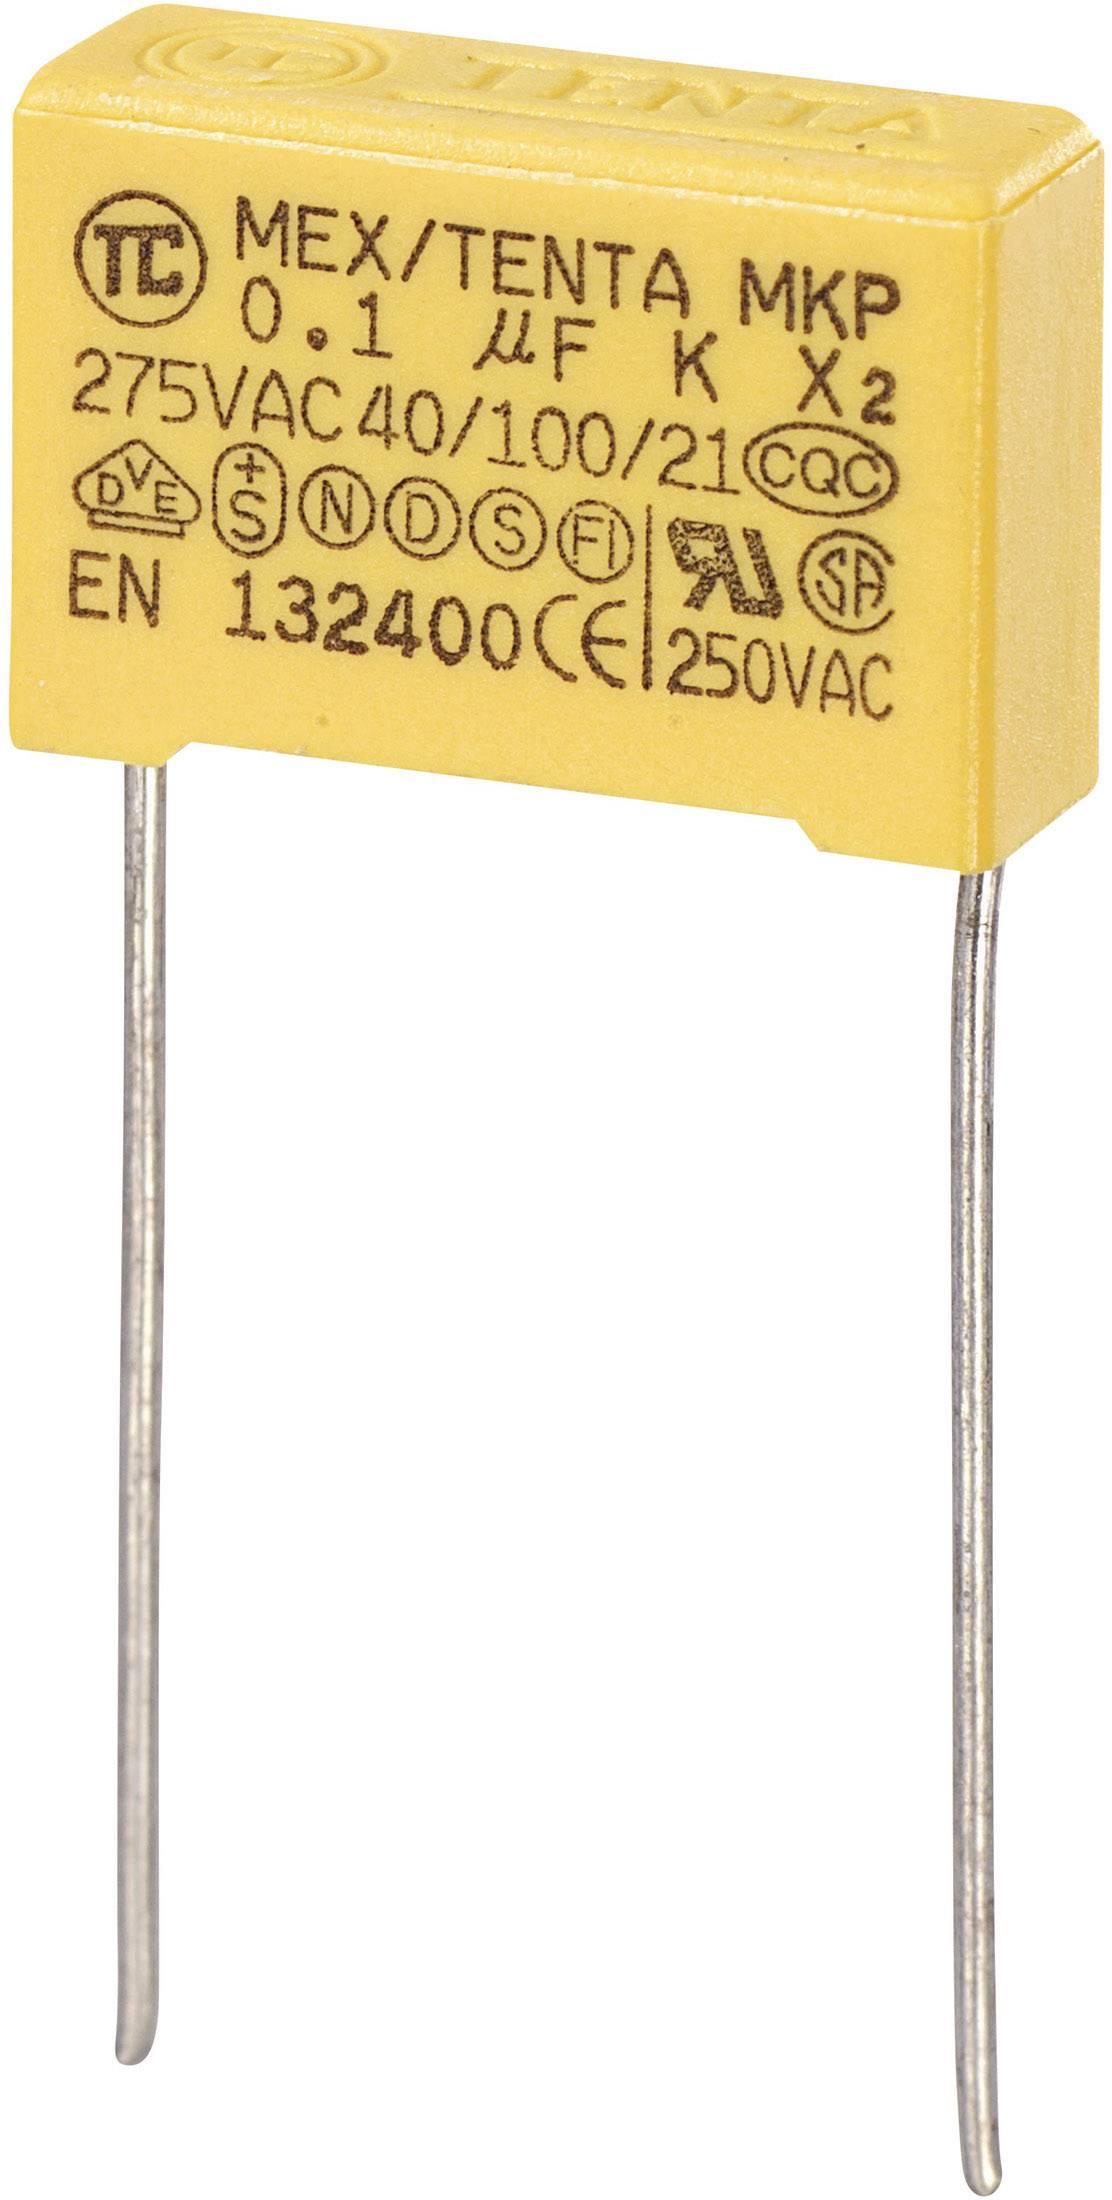 Foliový kondenzátor MKP, 0,1 µF, X2 275 V/AC, 10 %, 18 x 6 x 12 mm